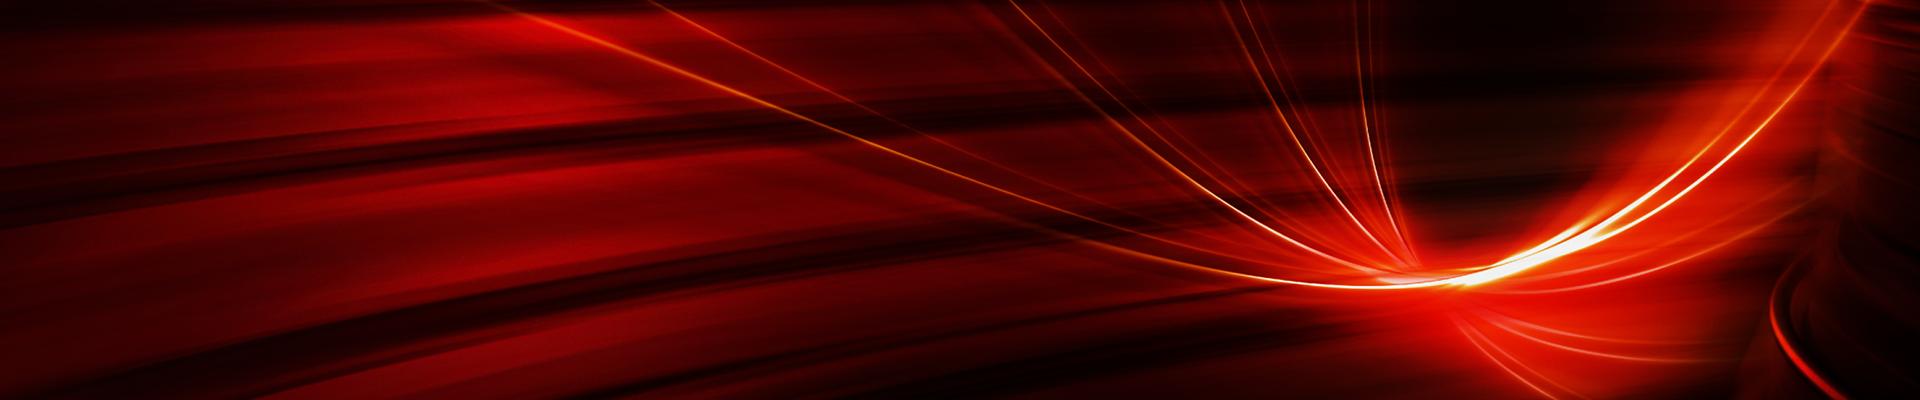 Technyl® RED High Temperature Polyamide